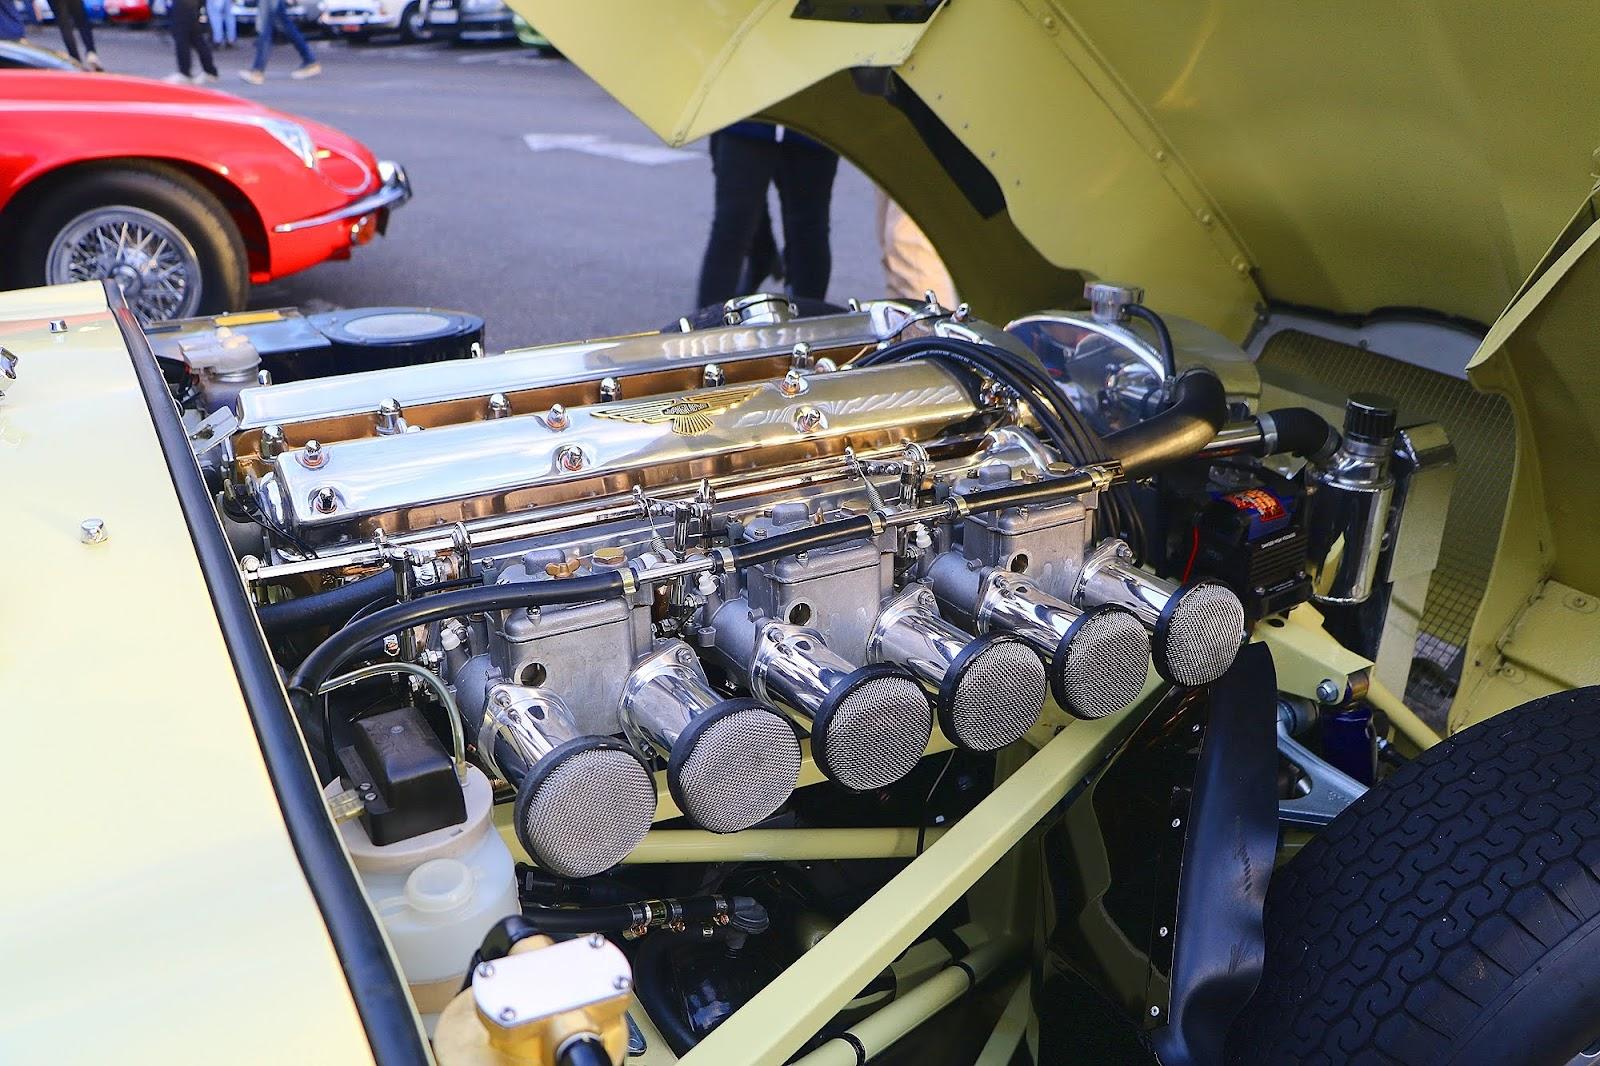 1964 Jaguar E-Type 3.8 Engine Bay.jpg